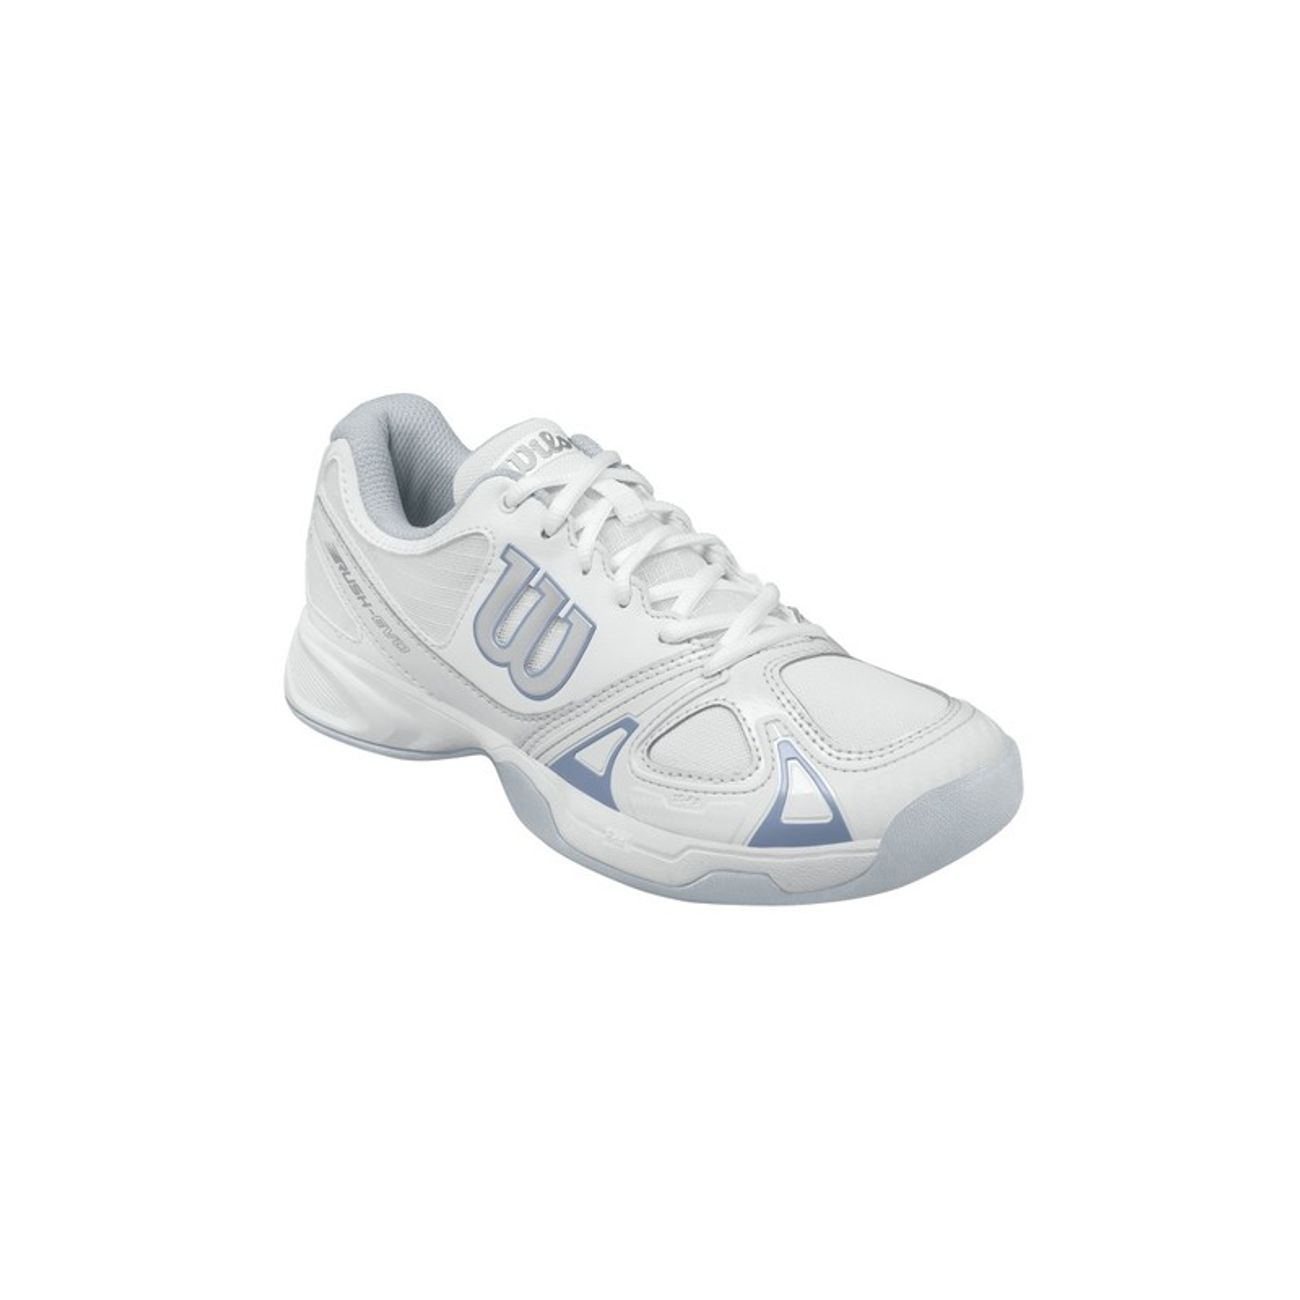 Tennis adulte WILSON Adidas Barricade Club xJ Tallas - 4 US